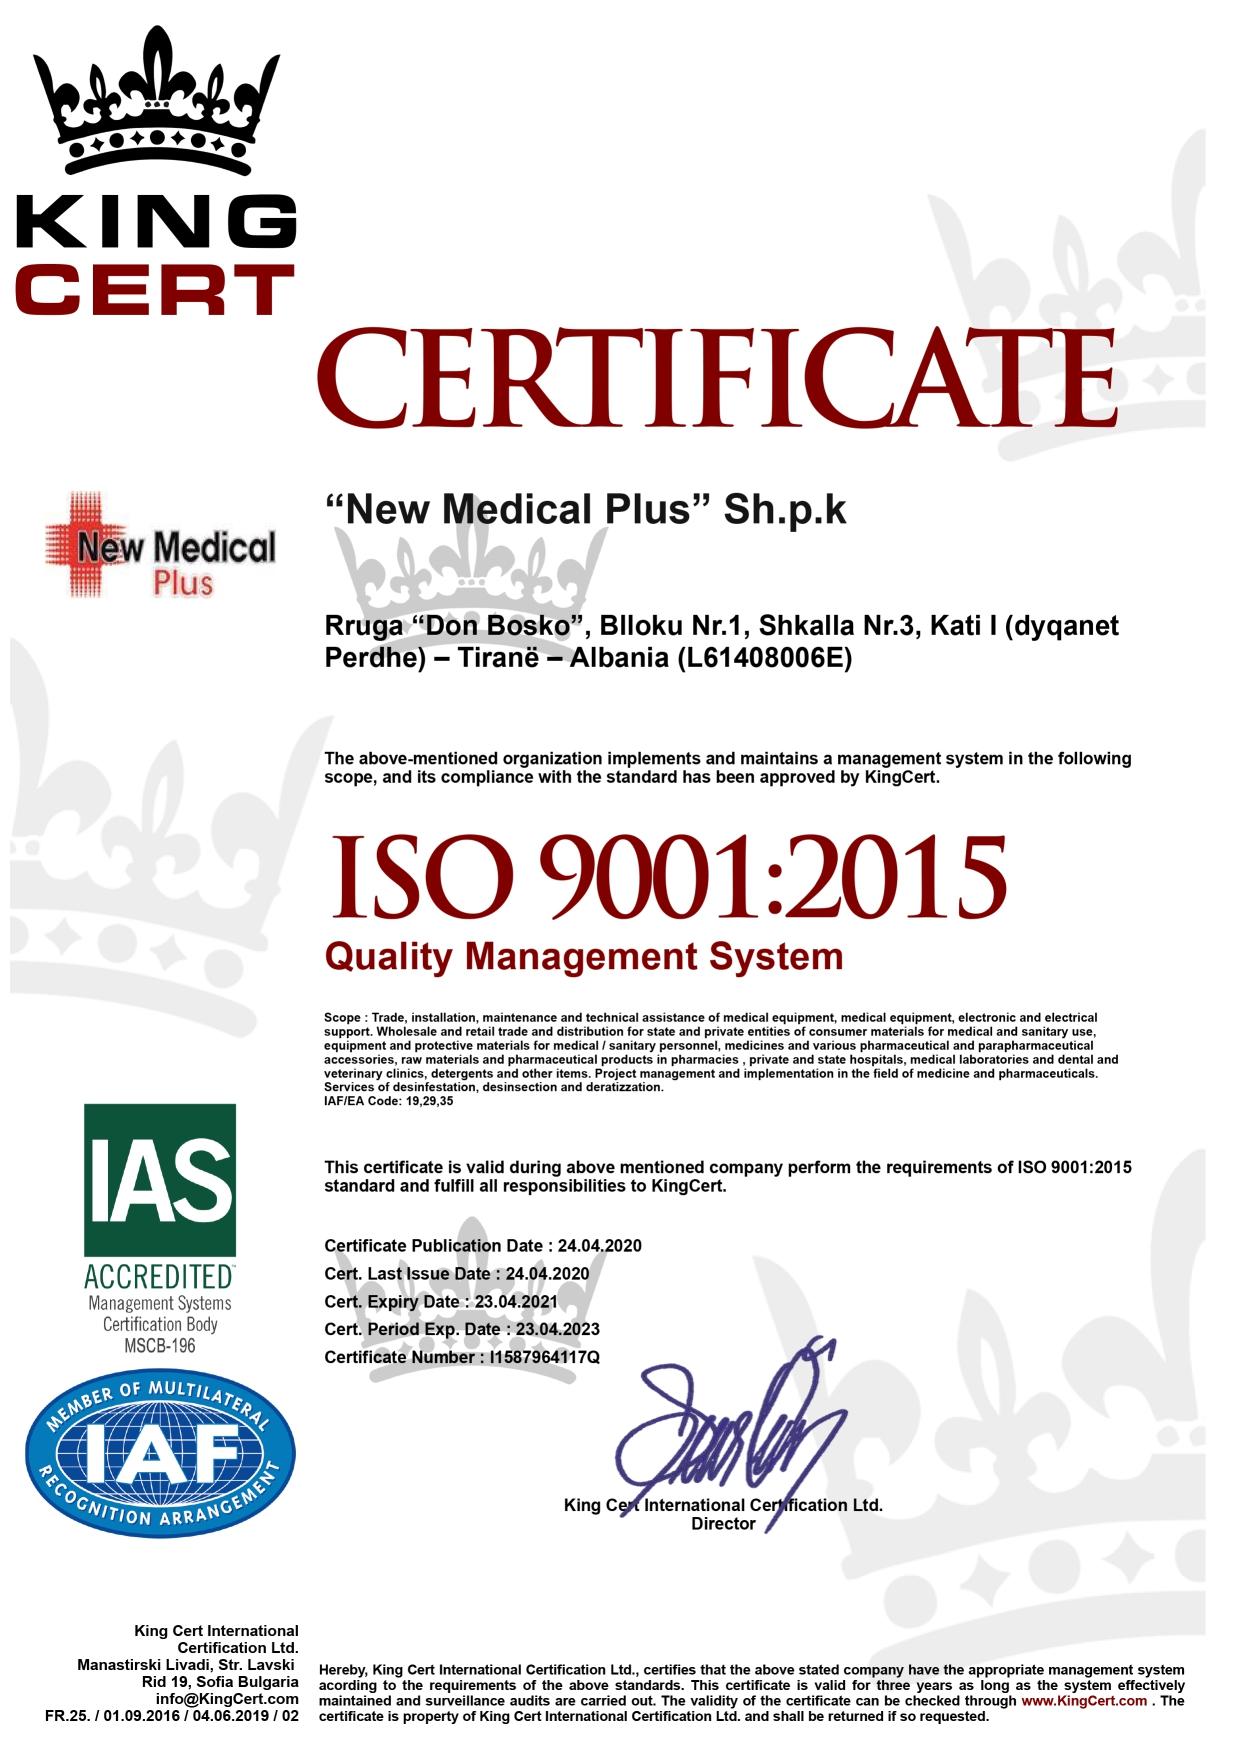 NEW MEDICAL PLUS WEBSITE CERTIFIKATA 5